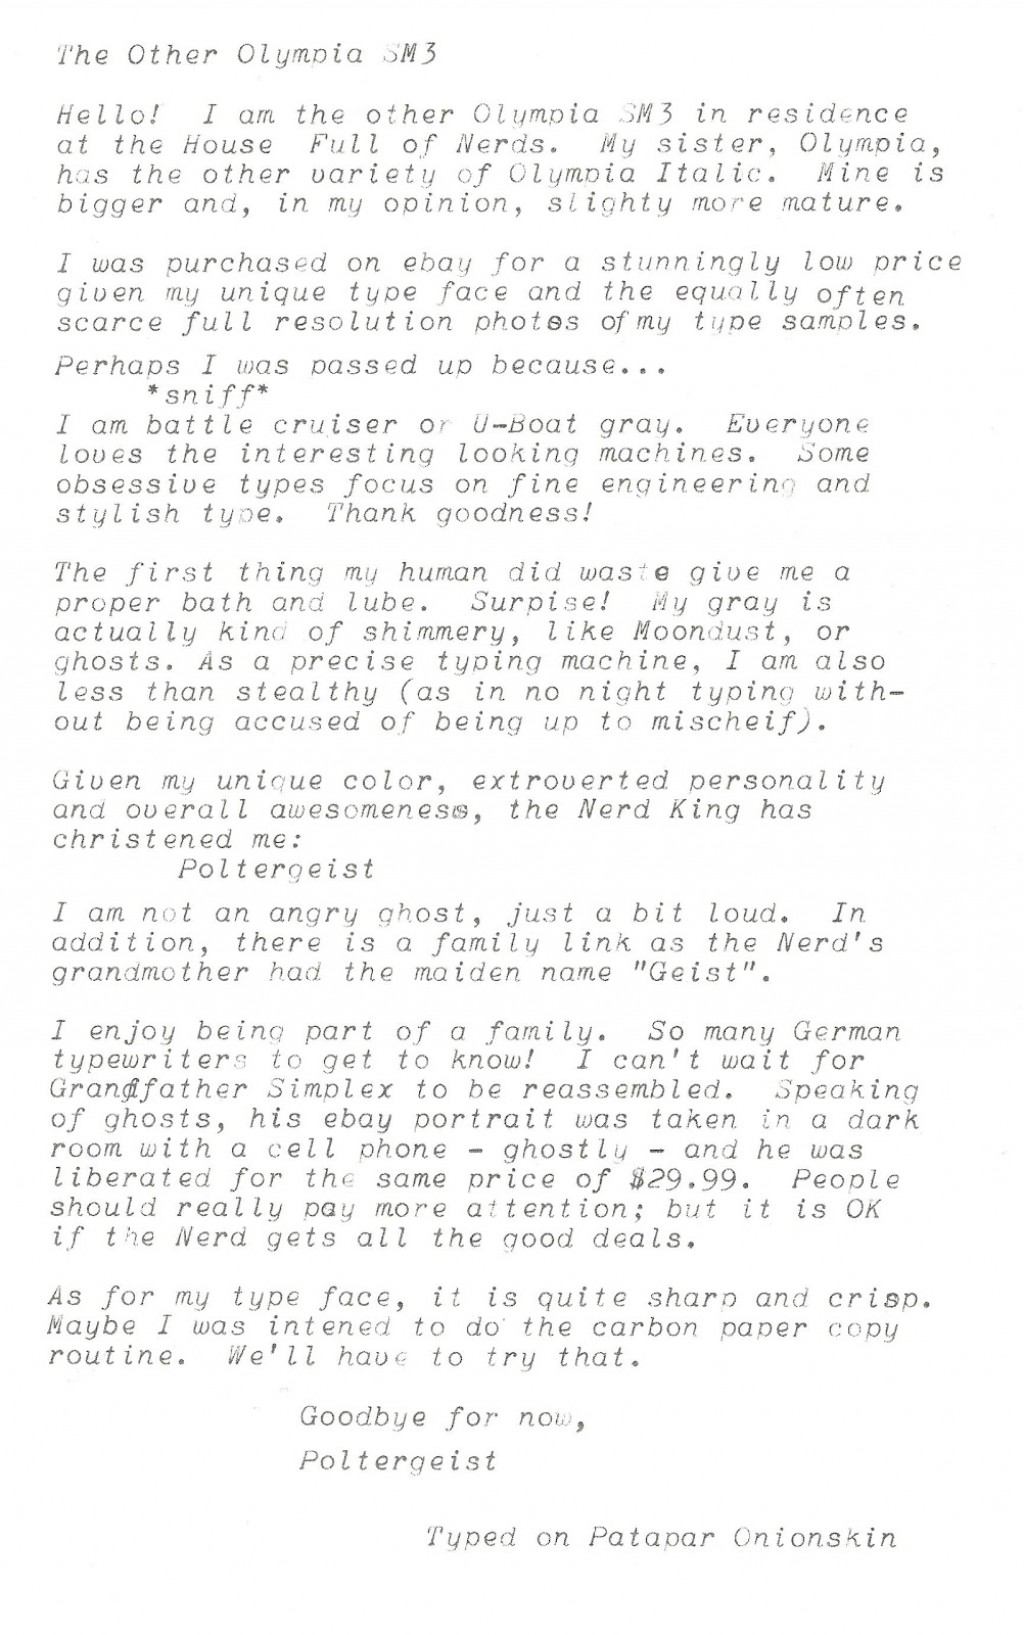 023 Fix My Essay Example Olympiasm3poltergeistintroduction11 Singular College Generator Free Help Large